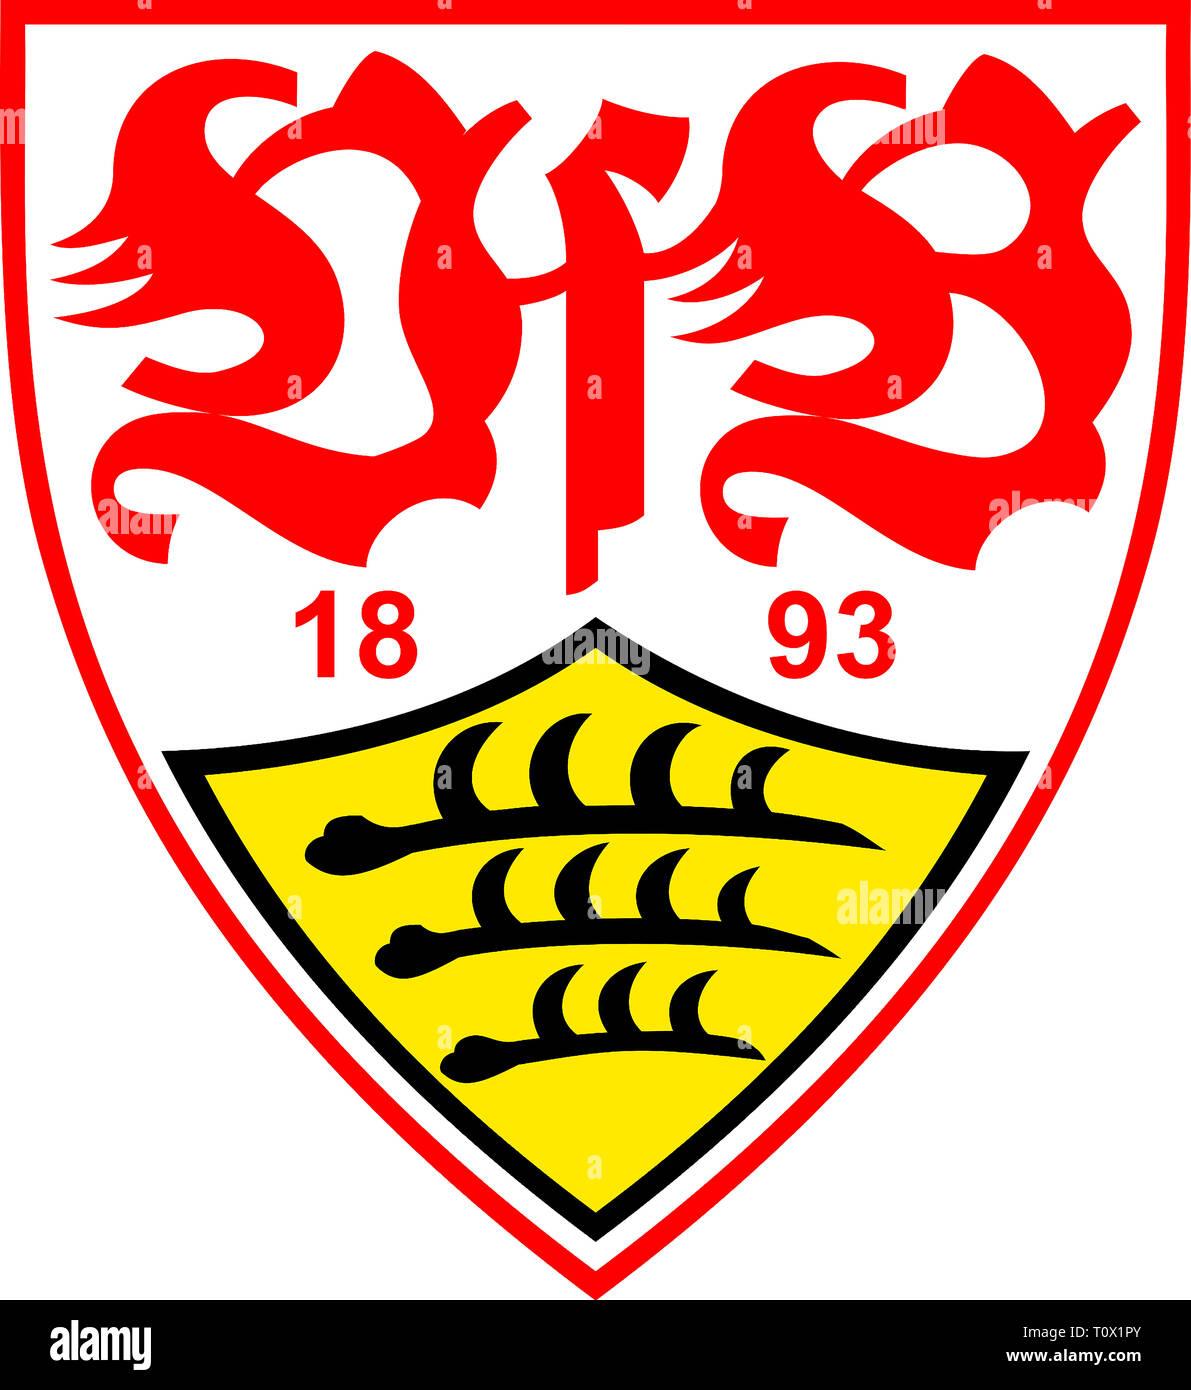 Logo of German football team VfB Stuttgart - Germany. - Stock Image